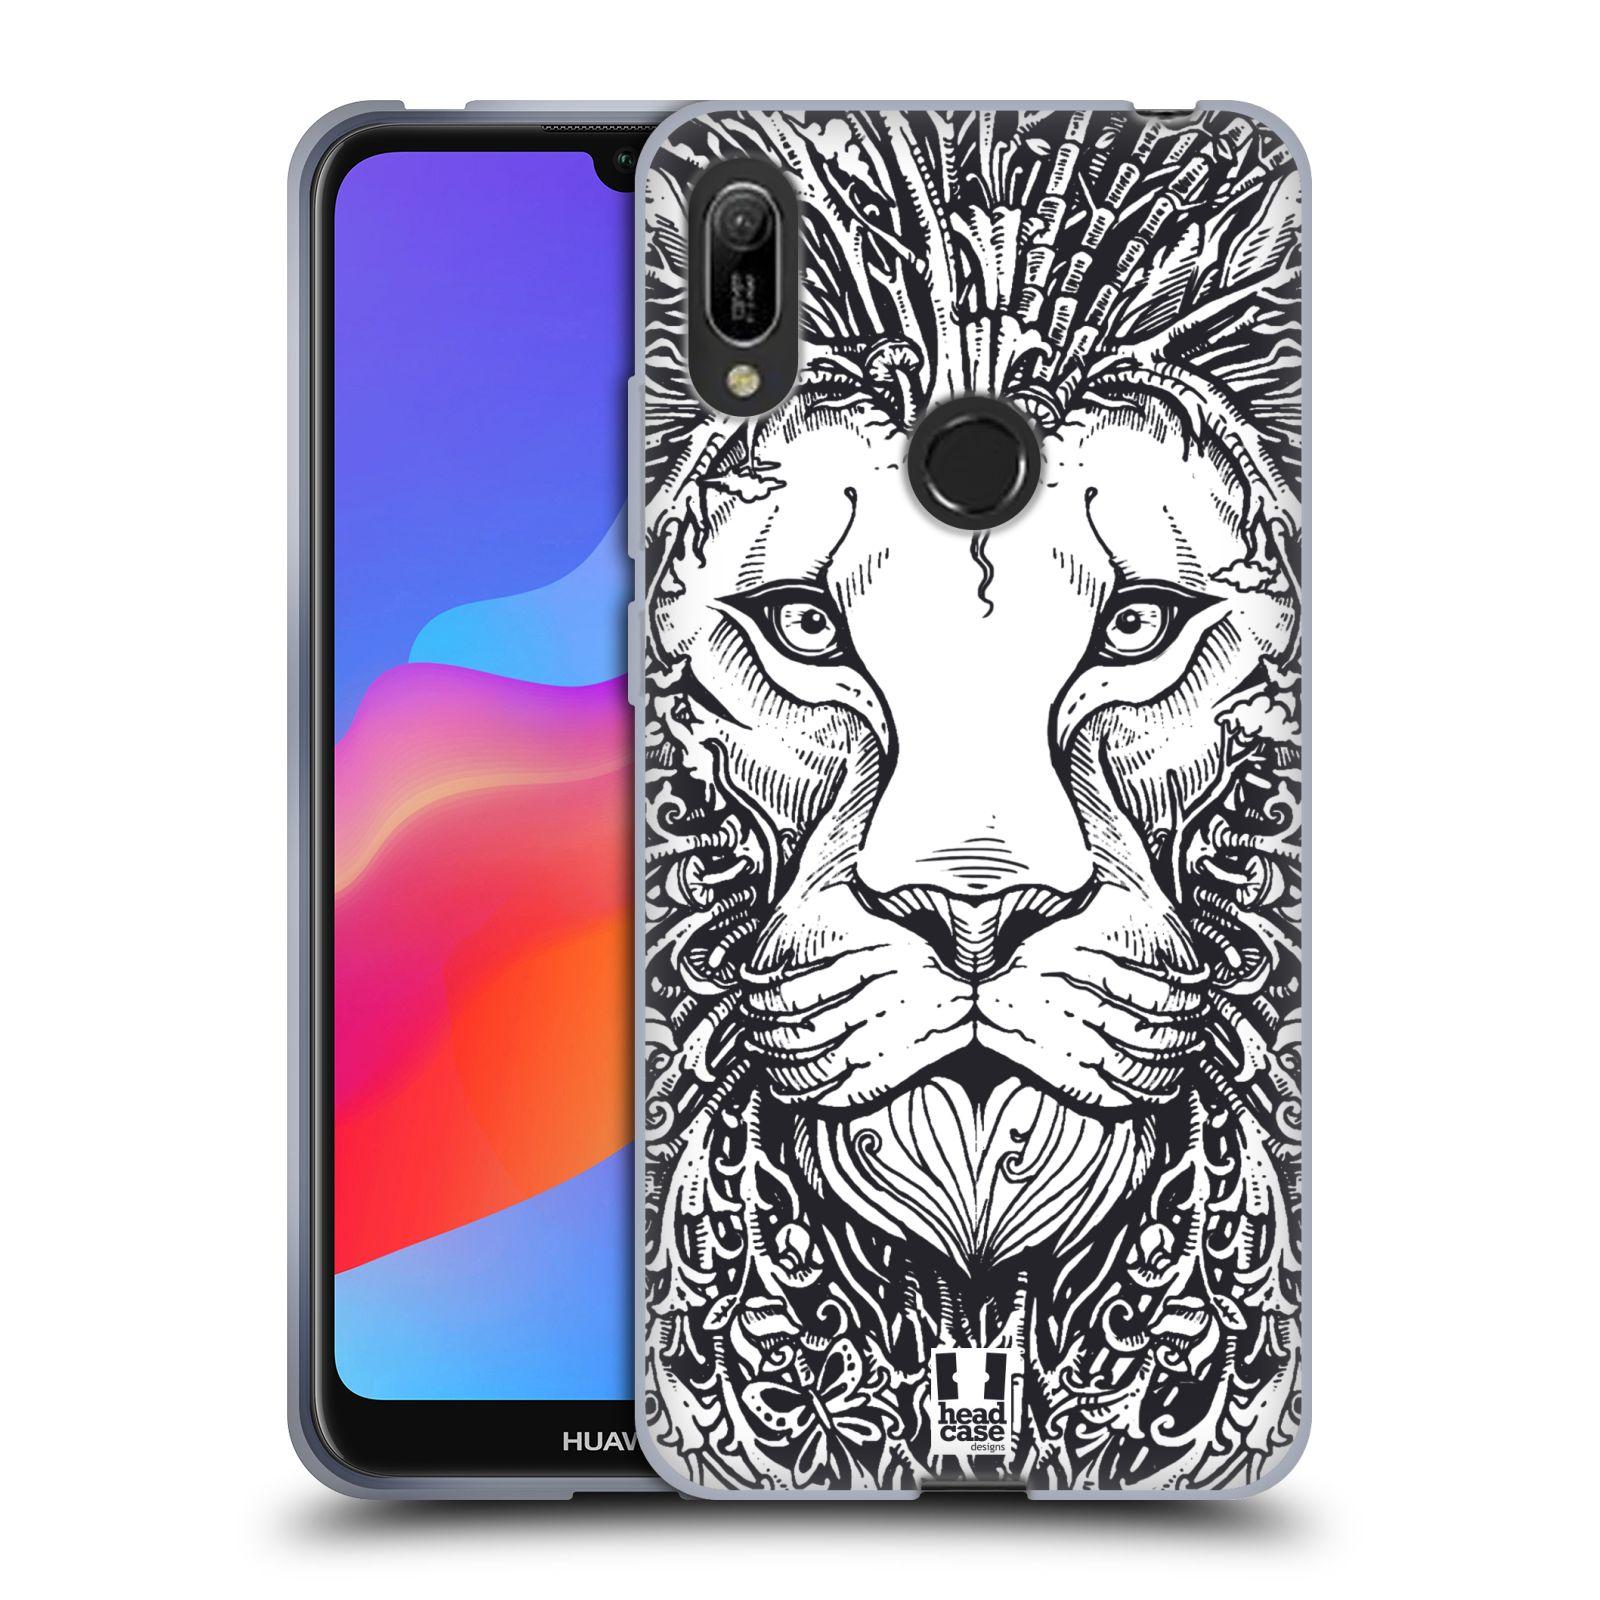 Silikonové pouzdro na mobil Huawei Y6 (2019) - Head Case - DOODLE TVÁŘ LEV